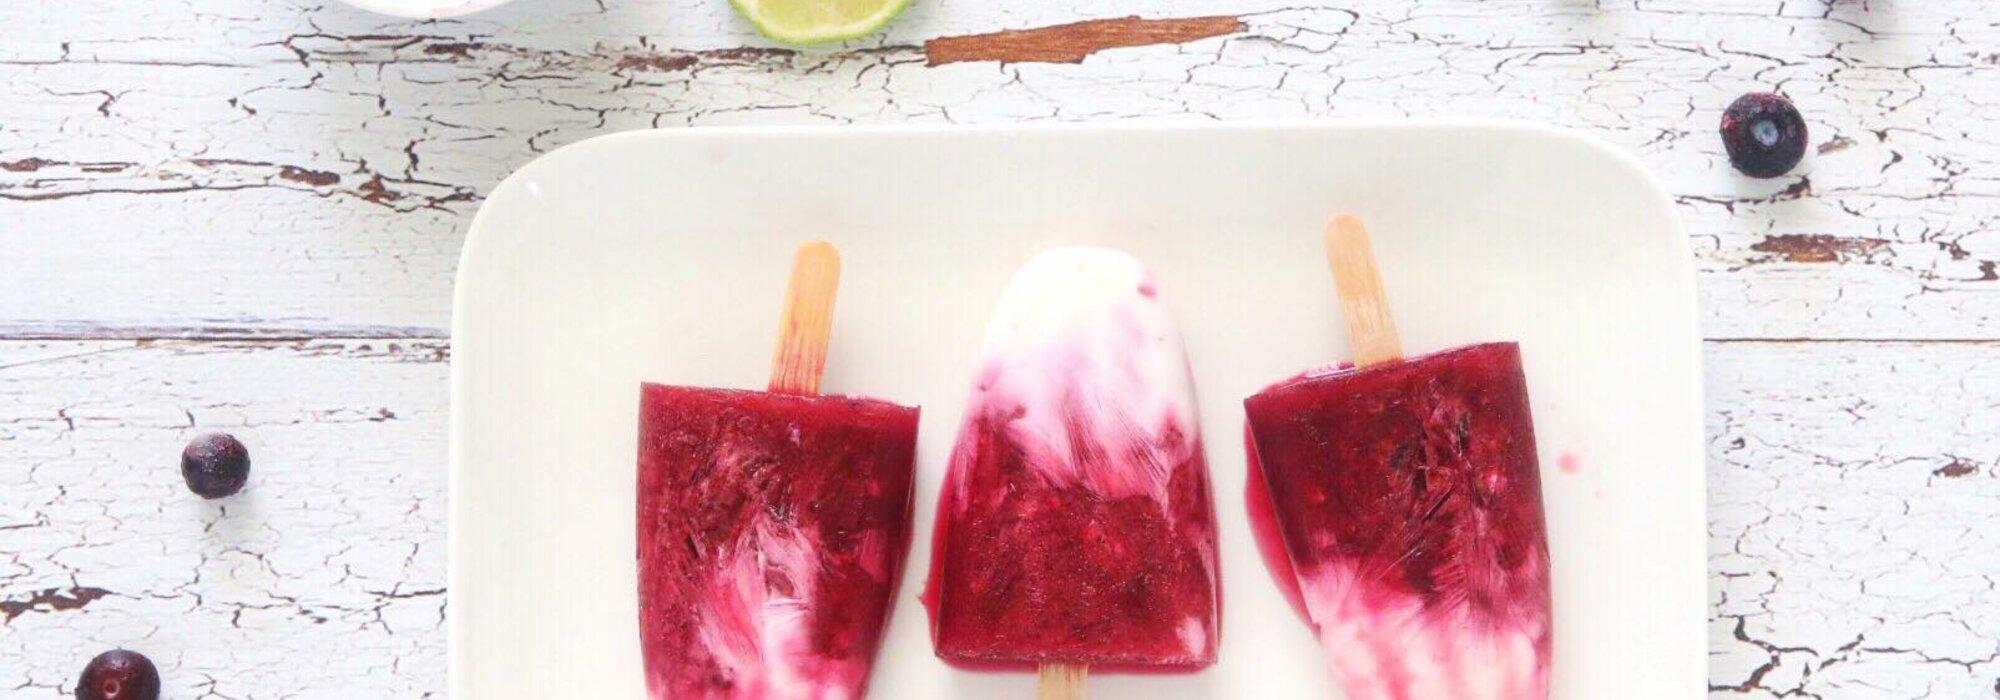 Koolhydraatarme blauwe bes limoen ijsjes